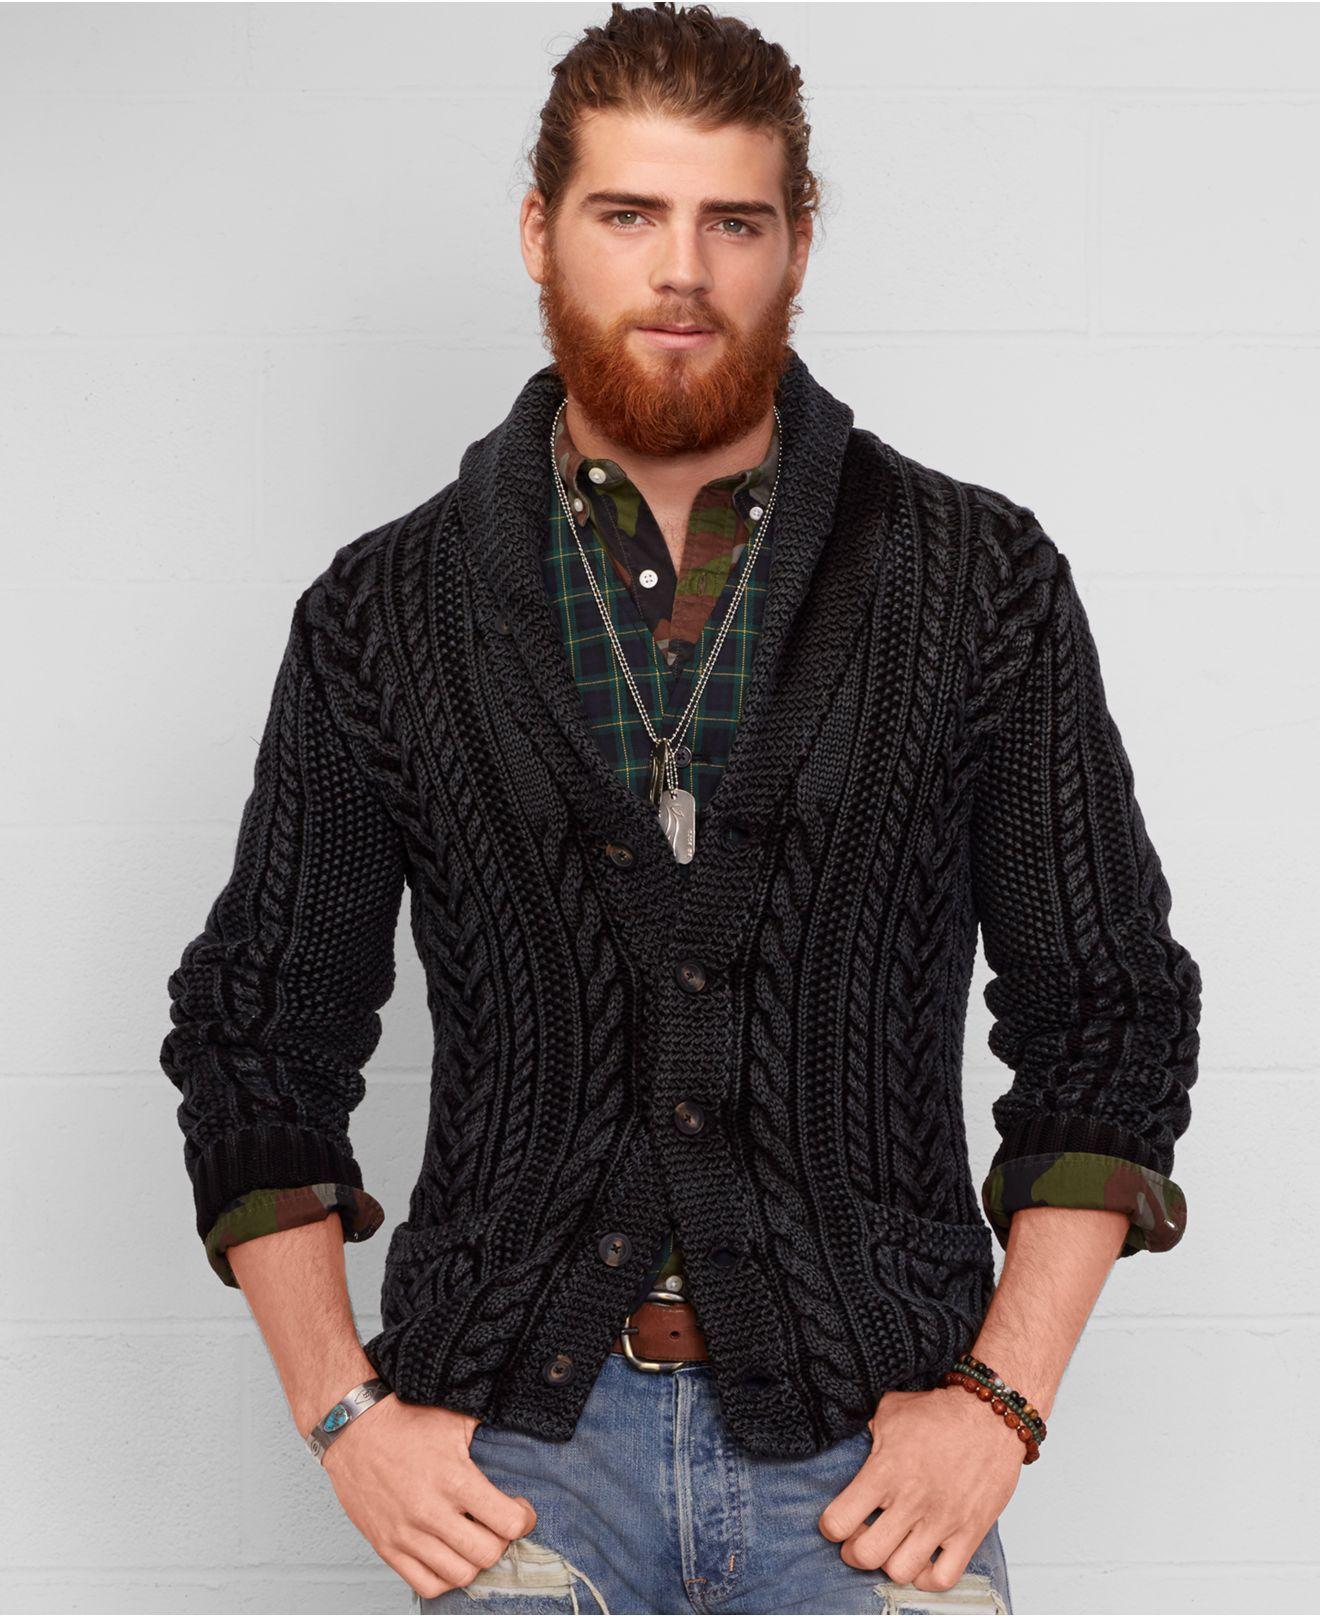 denim-supply-ralph-lauren-black-cable-knit-shawl-cardigan | My ...